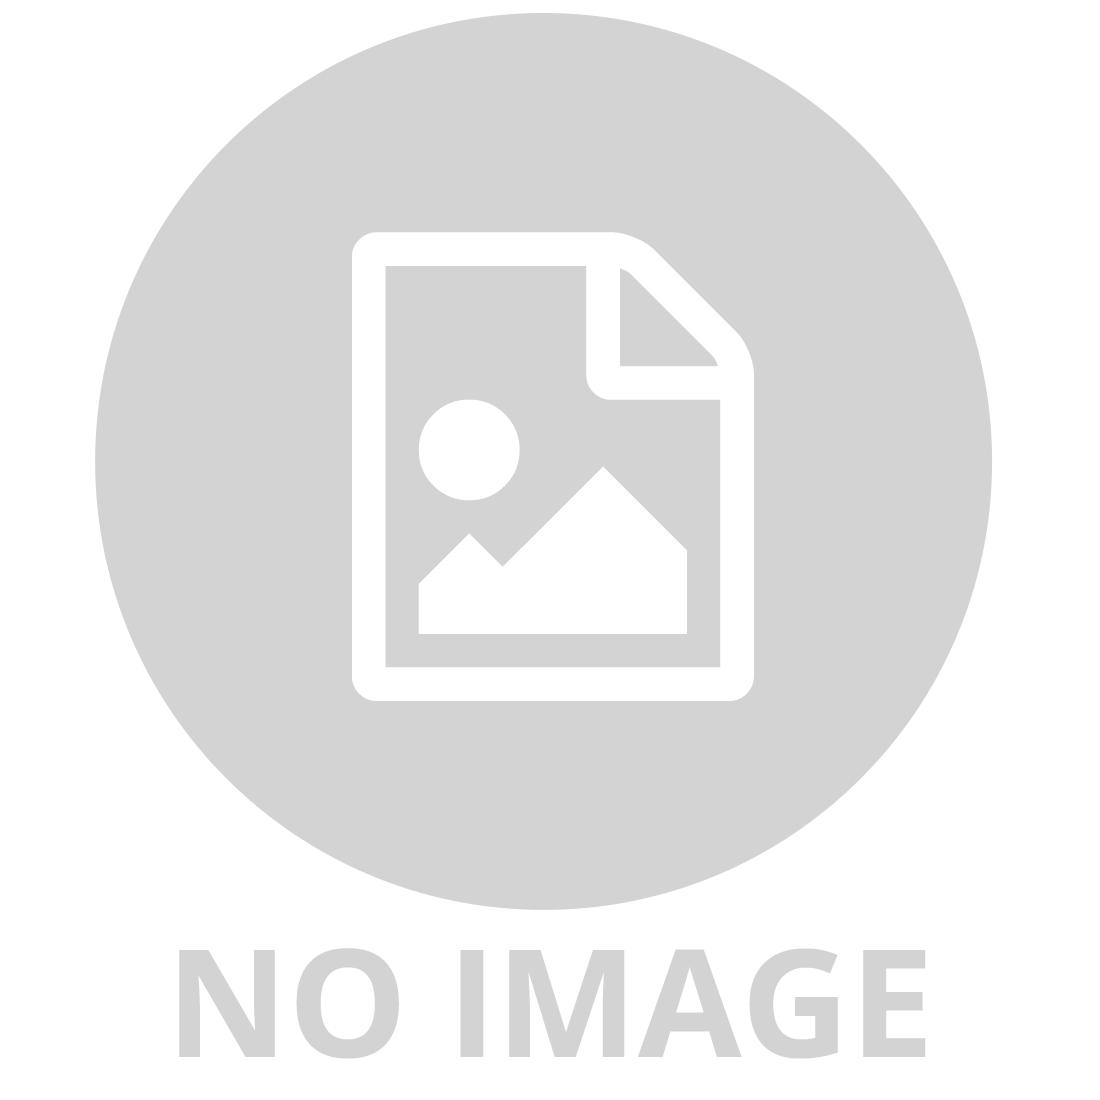 BICYCLE POKER RIDERBACK PLAYING CARDS